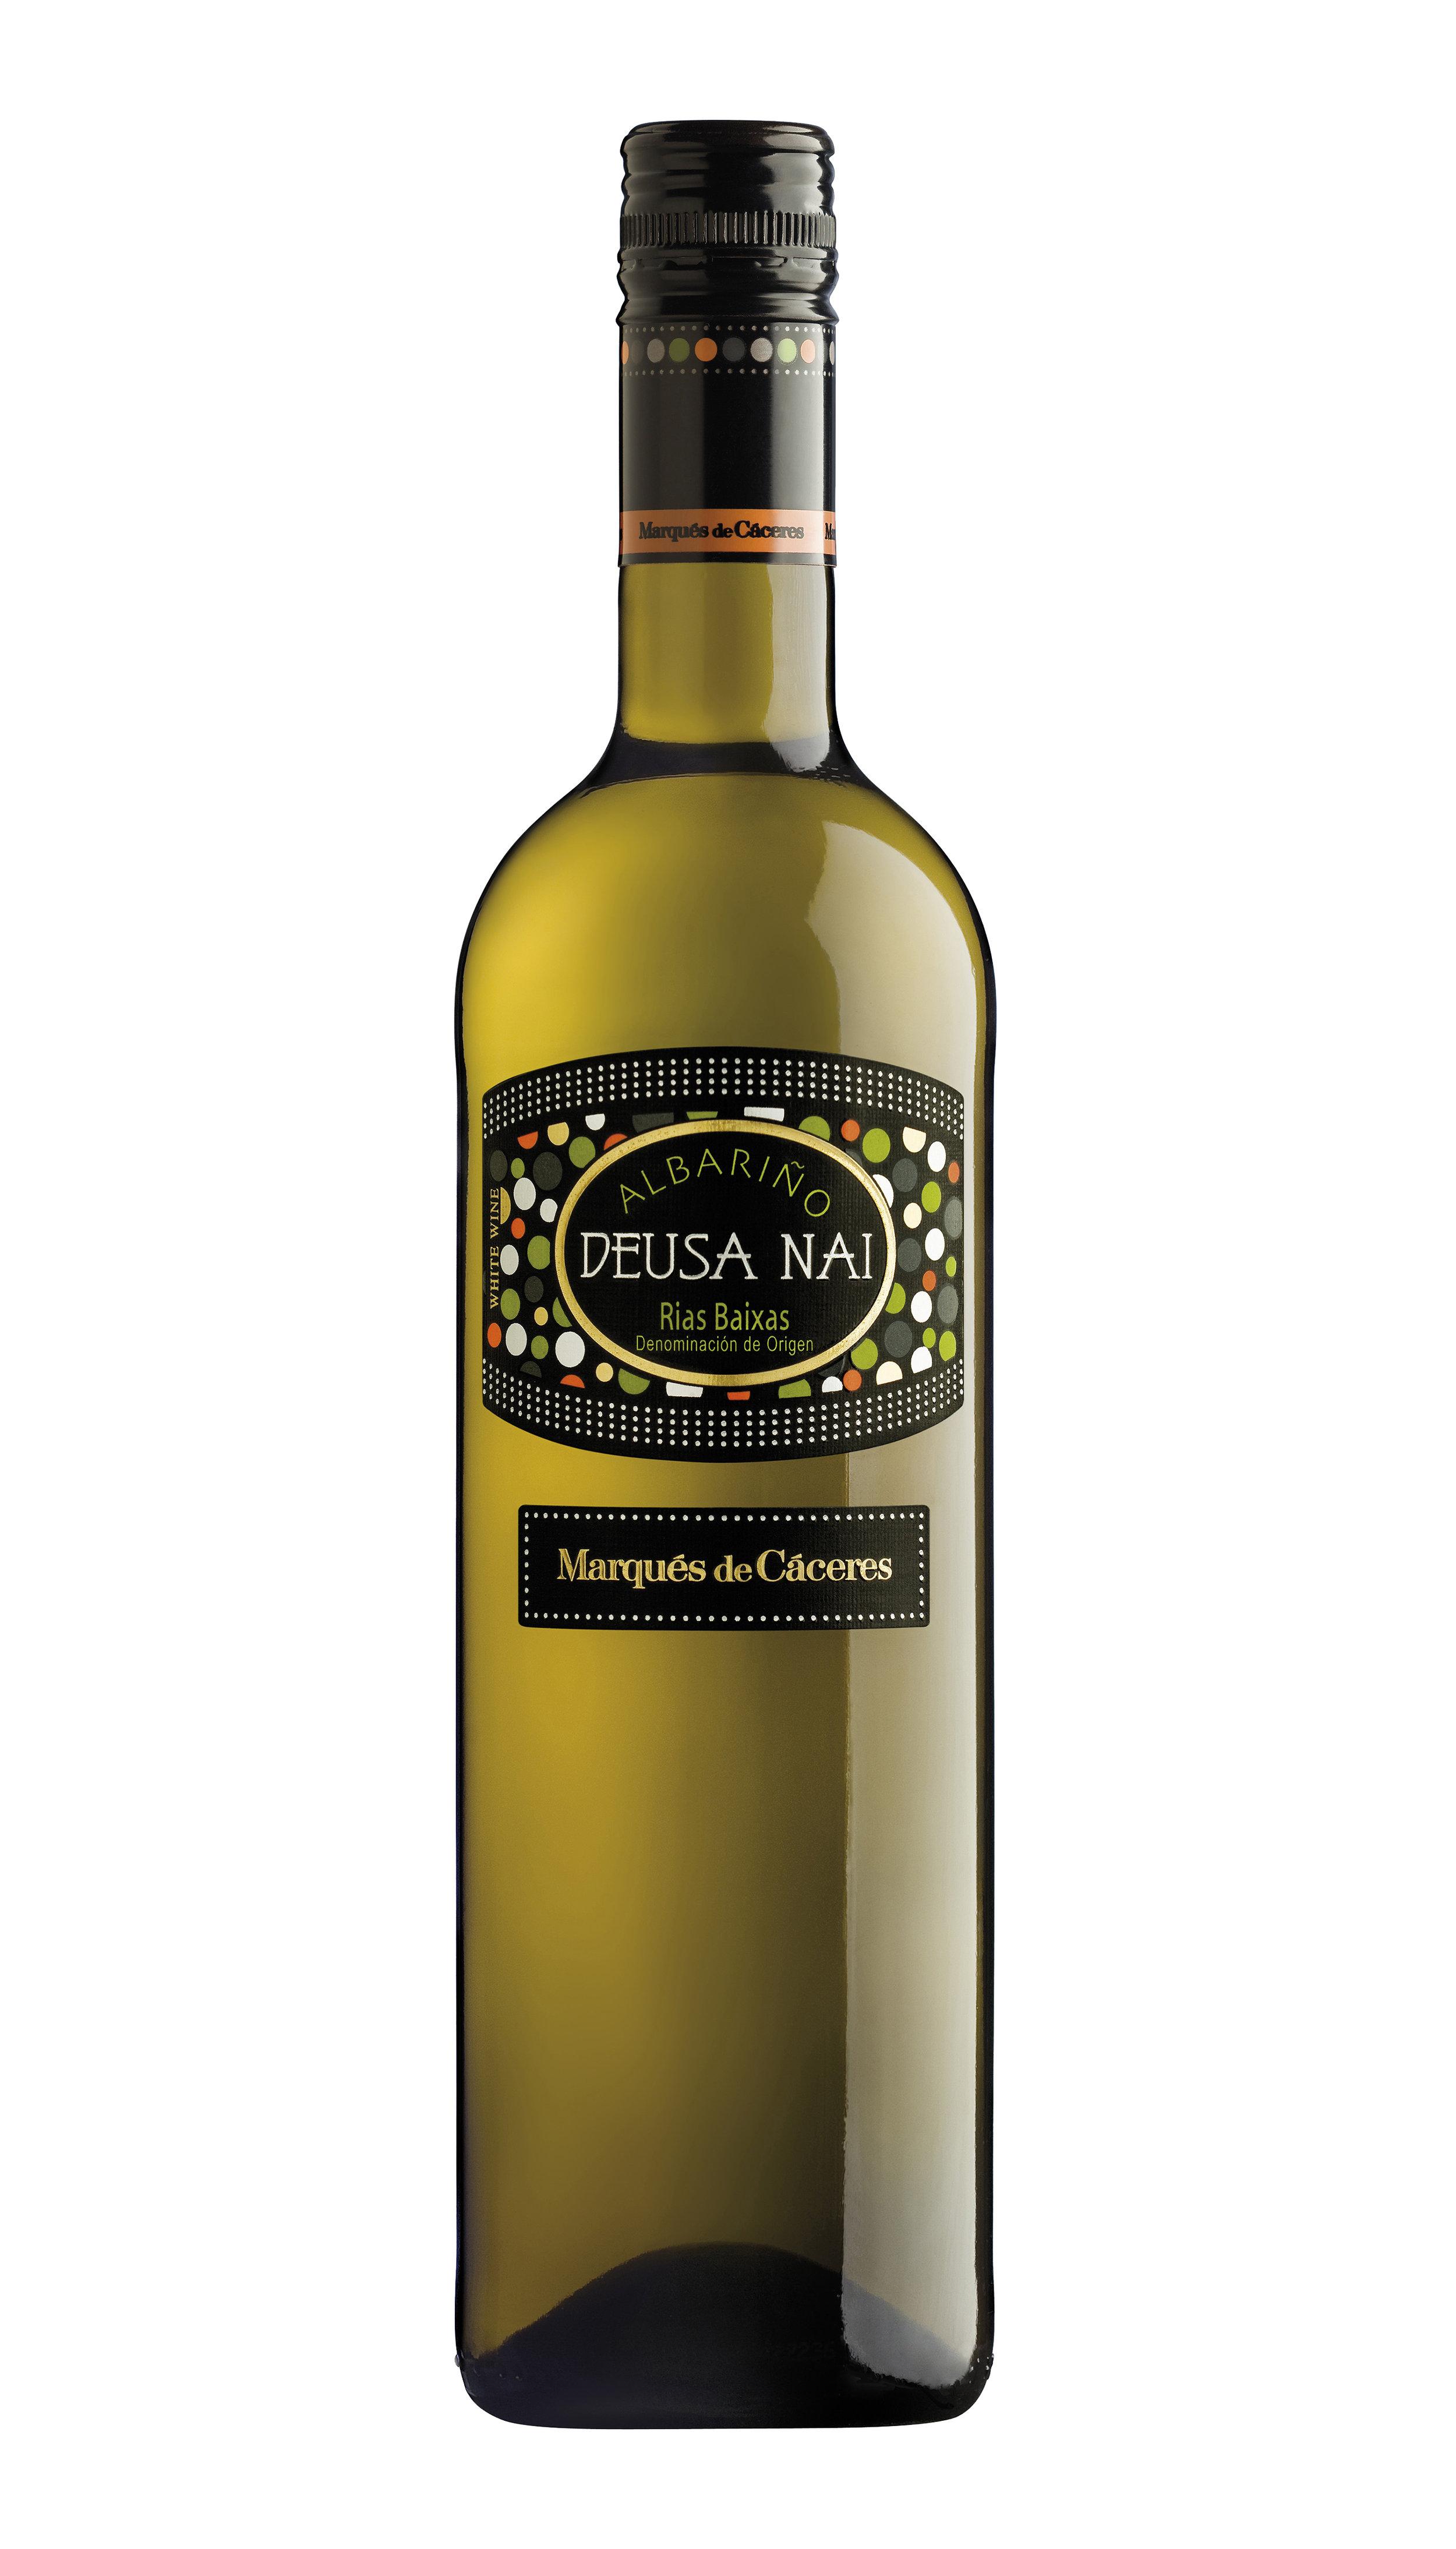 Marqués de Cáceres Deusa Nai Bottle.jpg